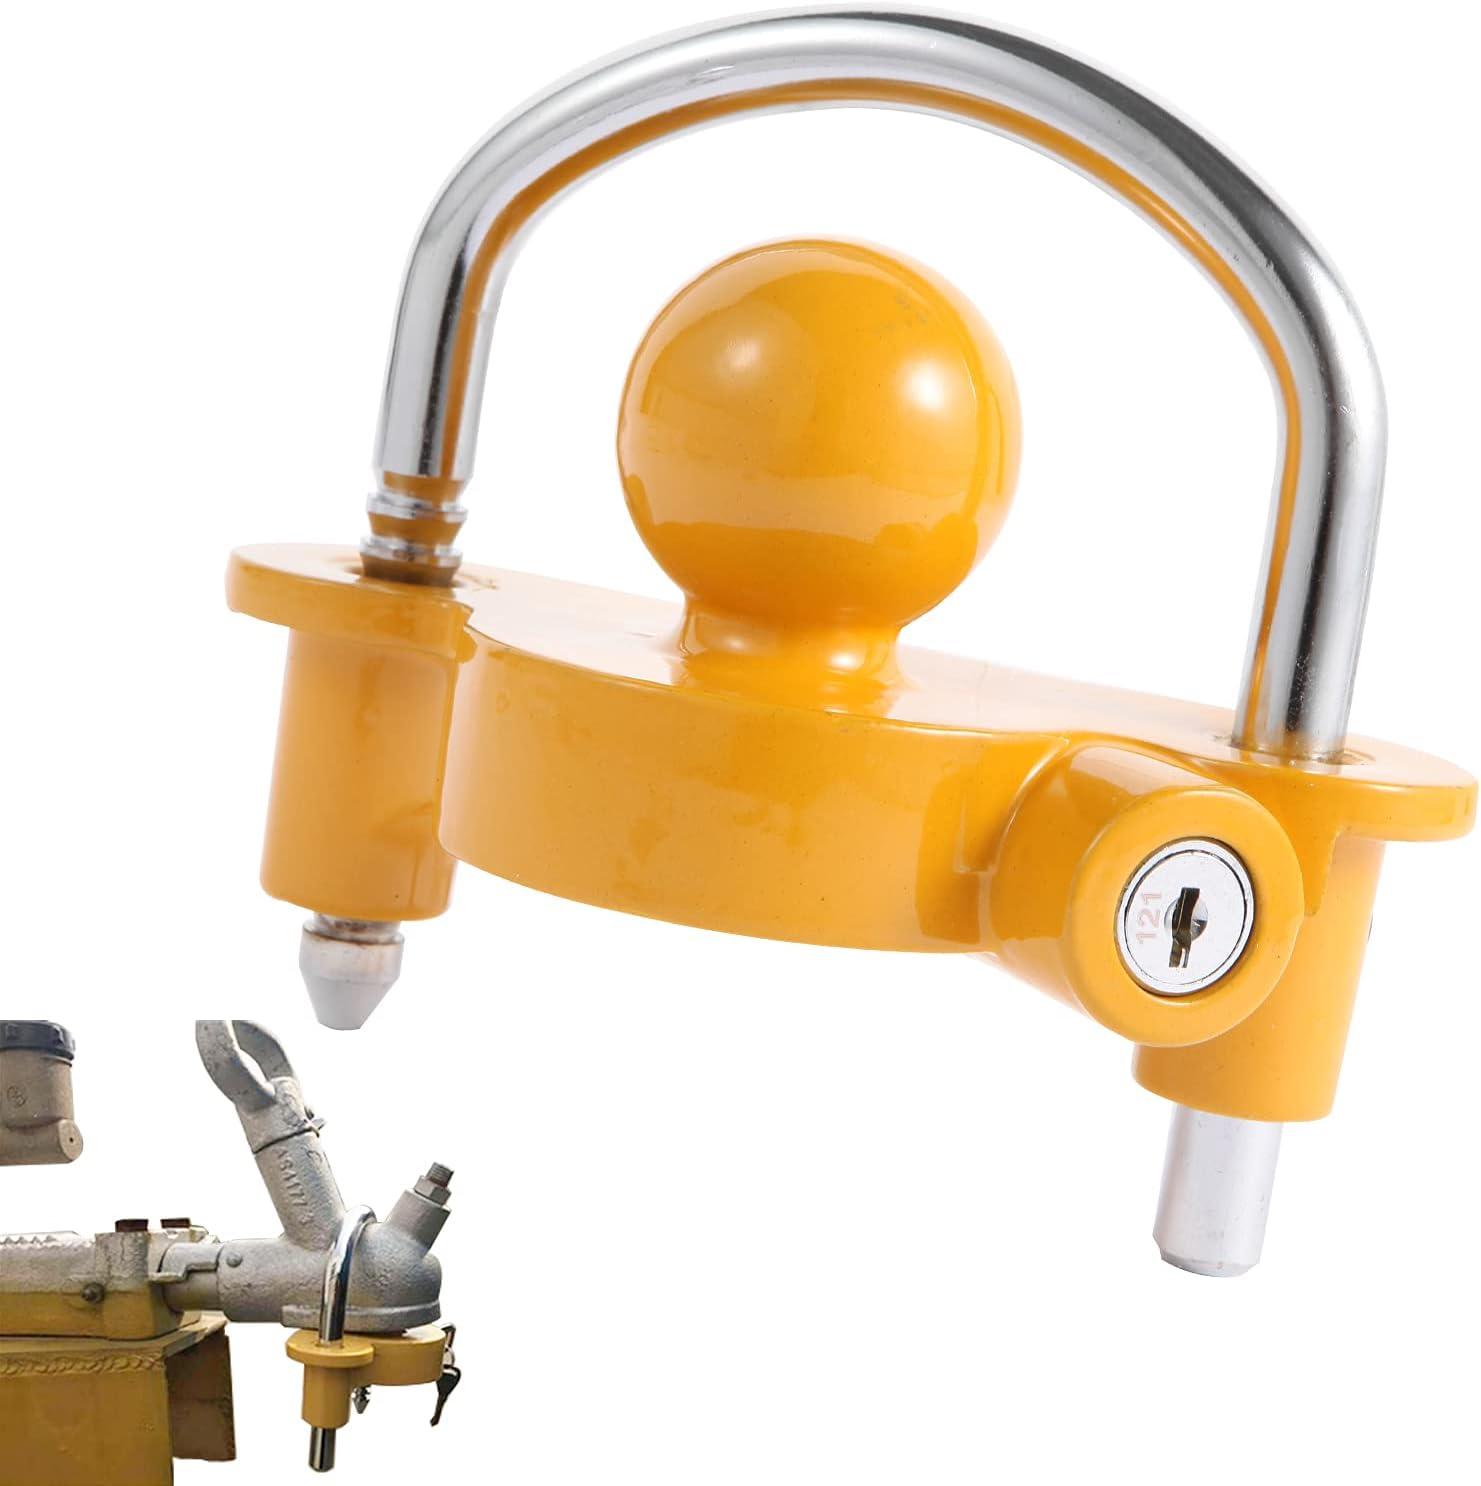 Popularity Esploratori Trailer Hitch Lock Direct stock discount Tow Ball Universal